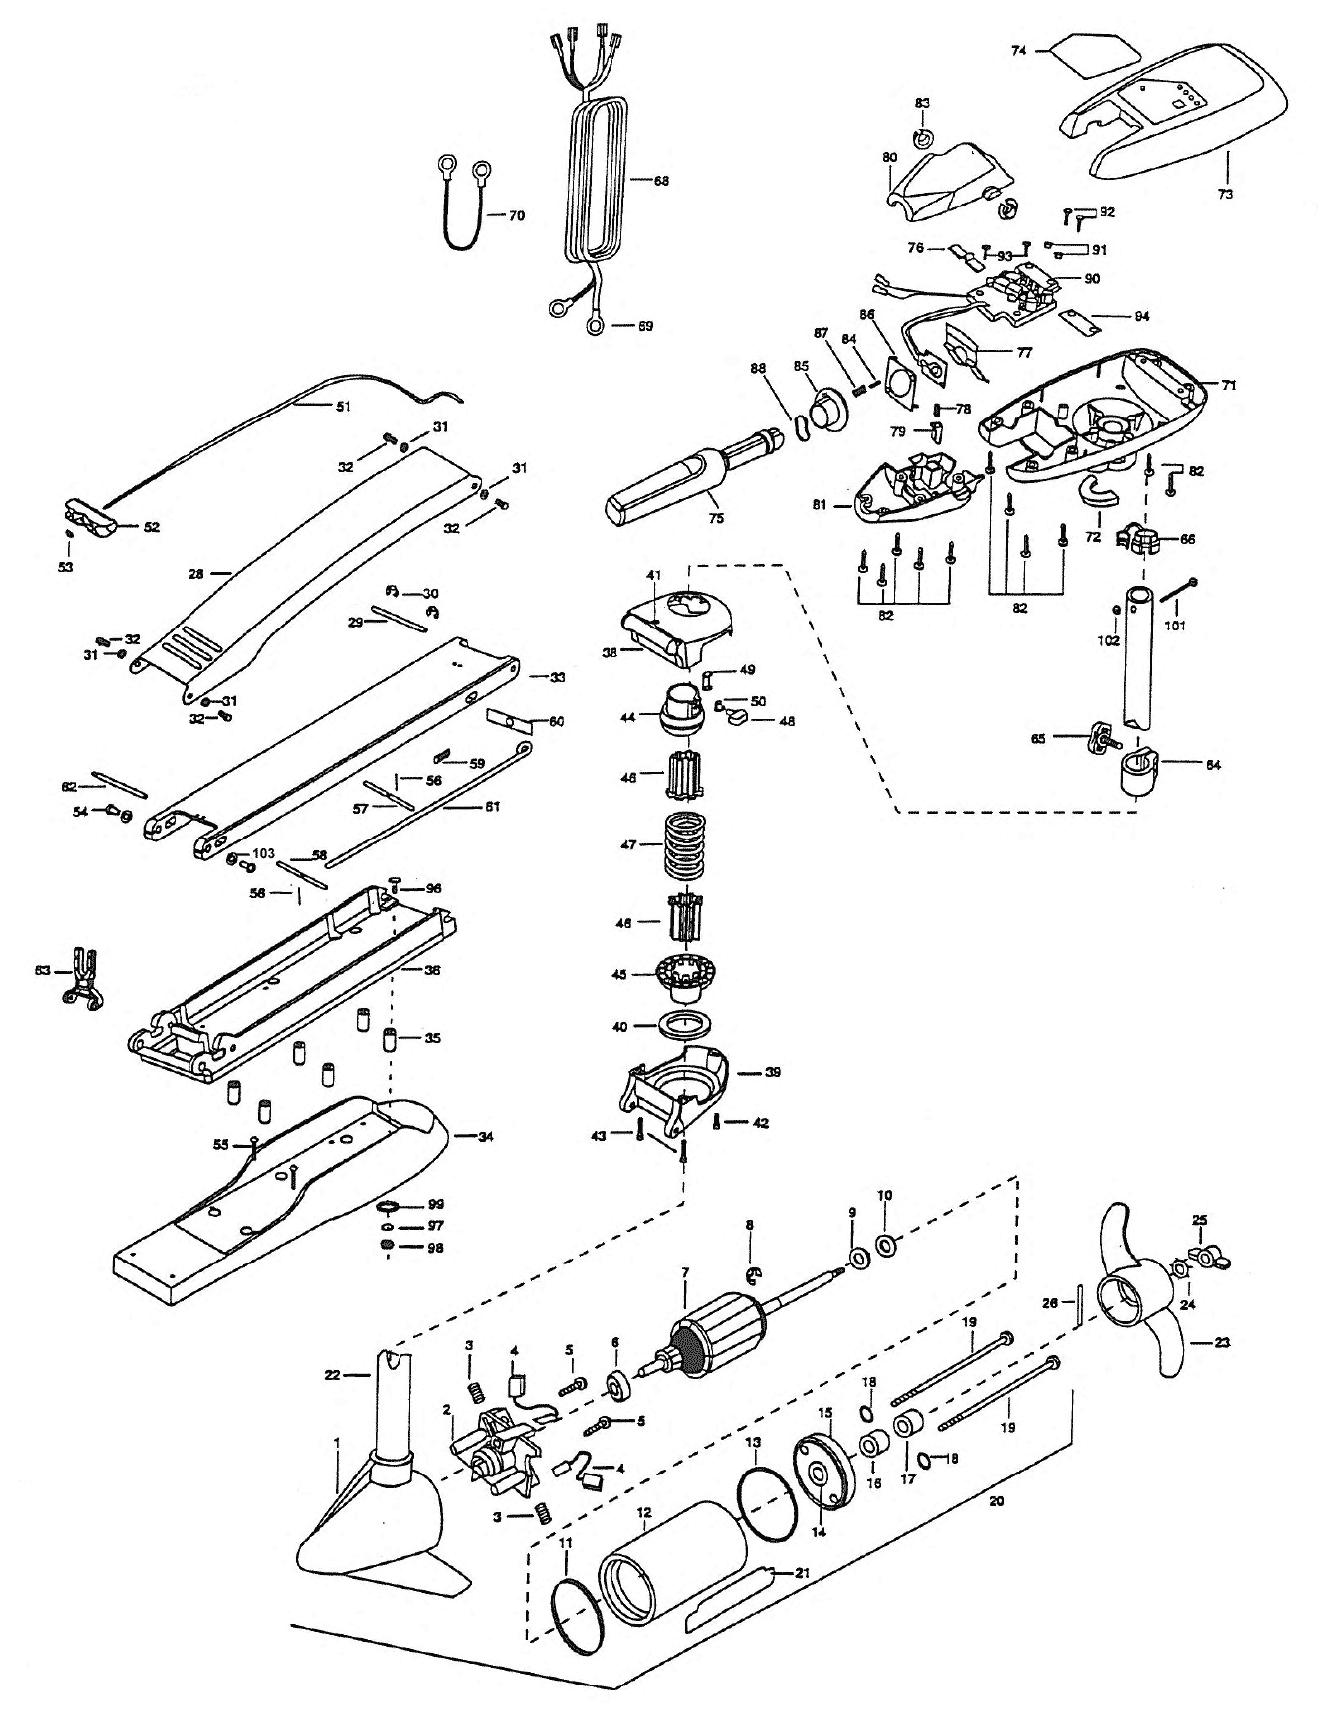 John Deere 4430 Wiring Diagram in addition Bush Hog Finish Mower Parts Wiring Diagrams besides 5 7 Hp Briggs Engine Diagram together with Yanmar Tne Wiring Diagram additionally Land Pride Parts Diagram. on bush hog wiring diagram